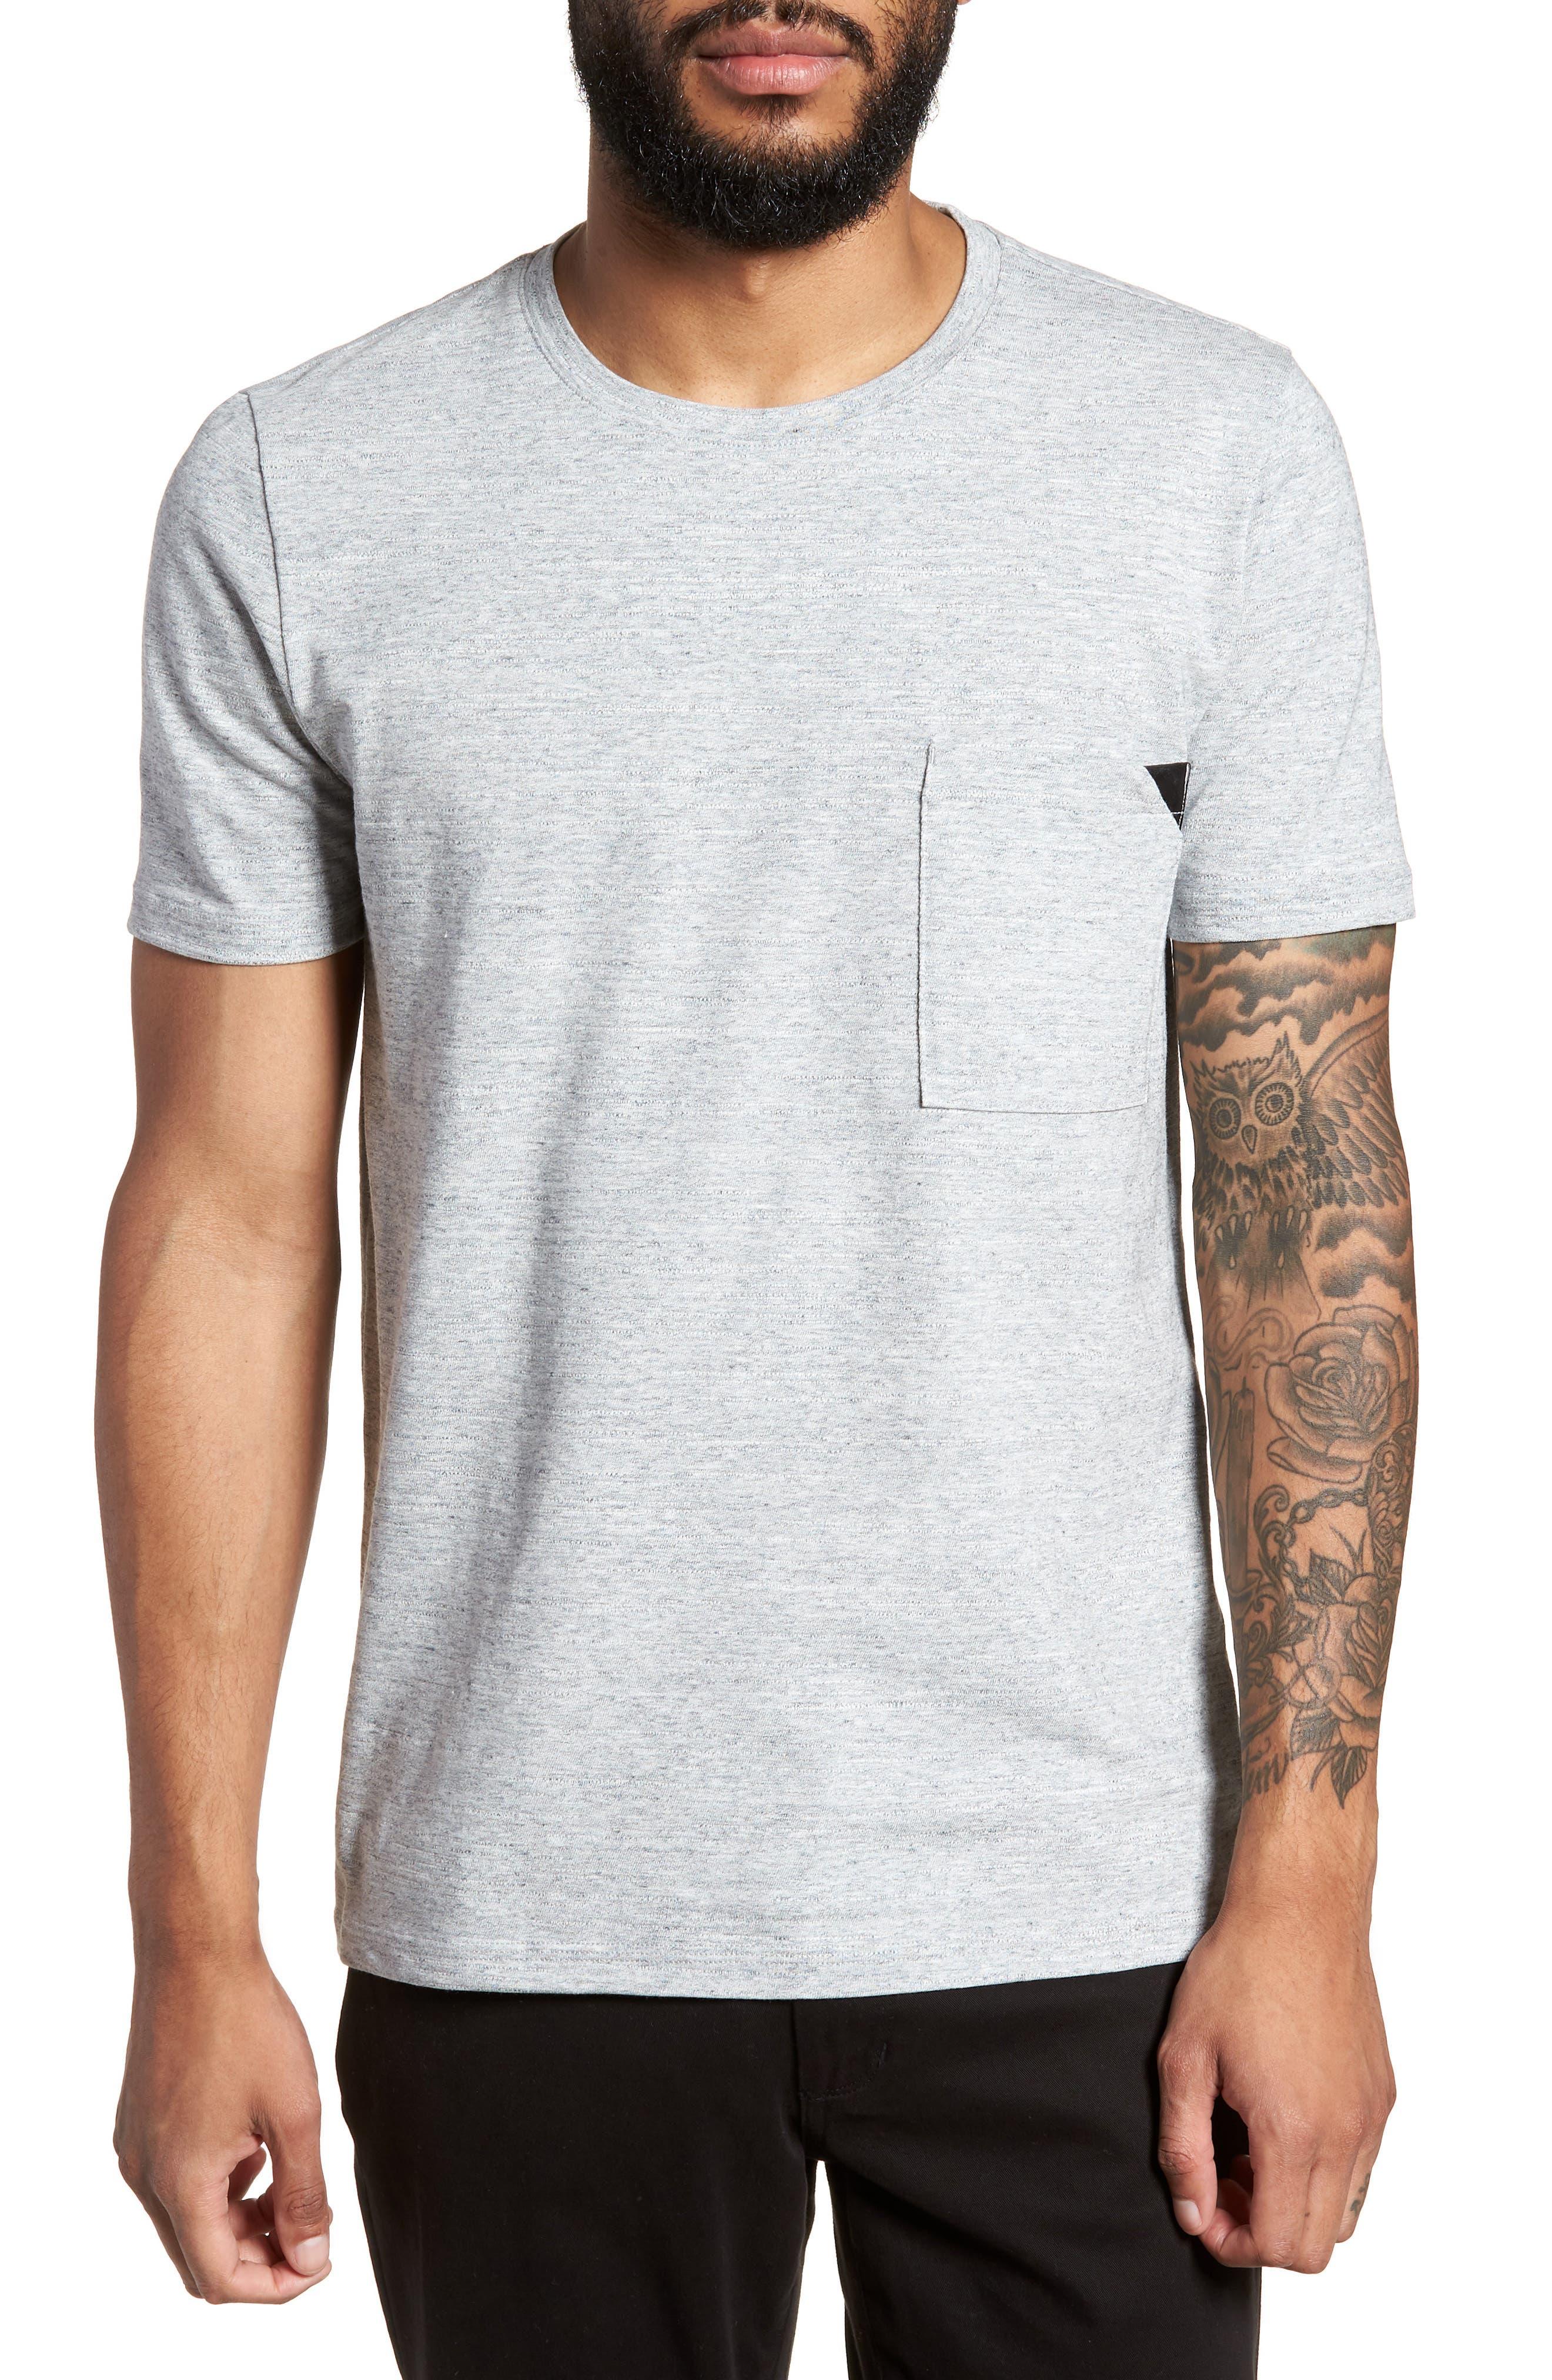 Dohnny Crewneck T-Shirt,                             Main thumbnail 1, color,                             061